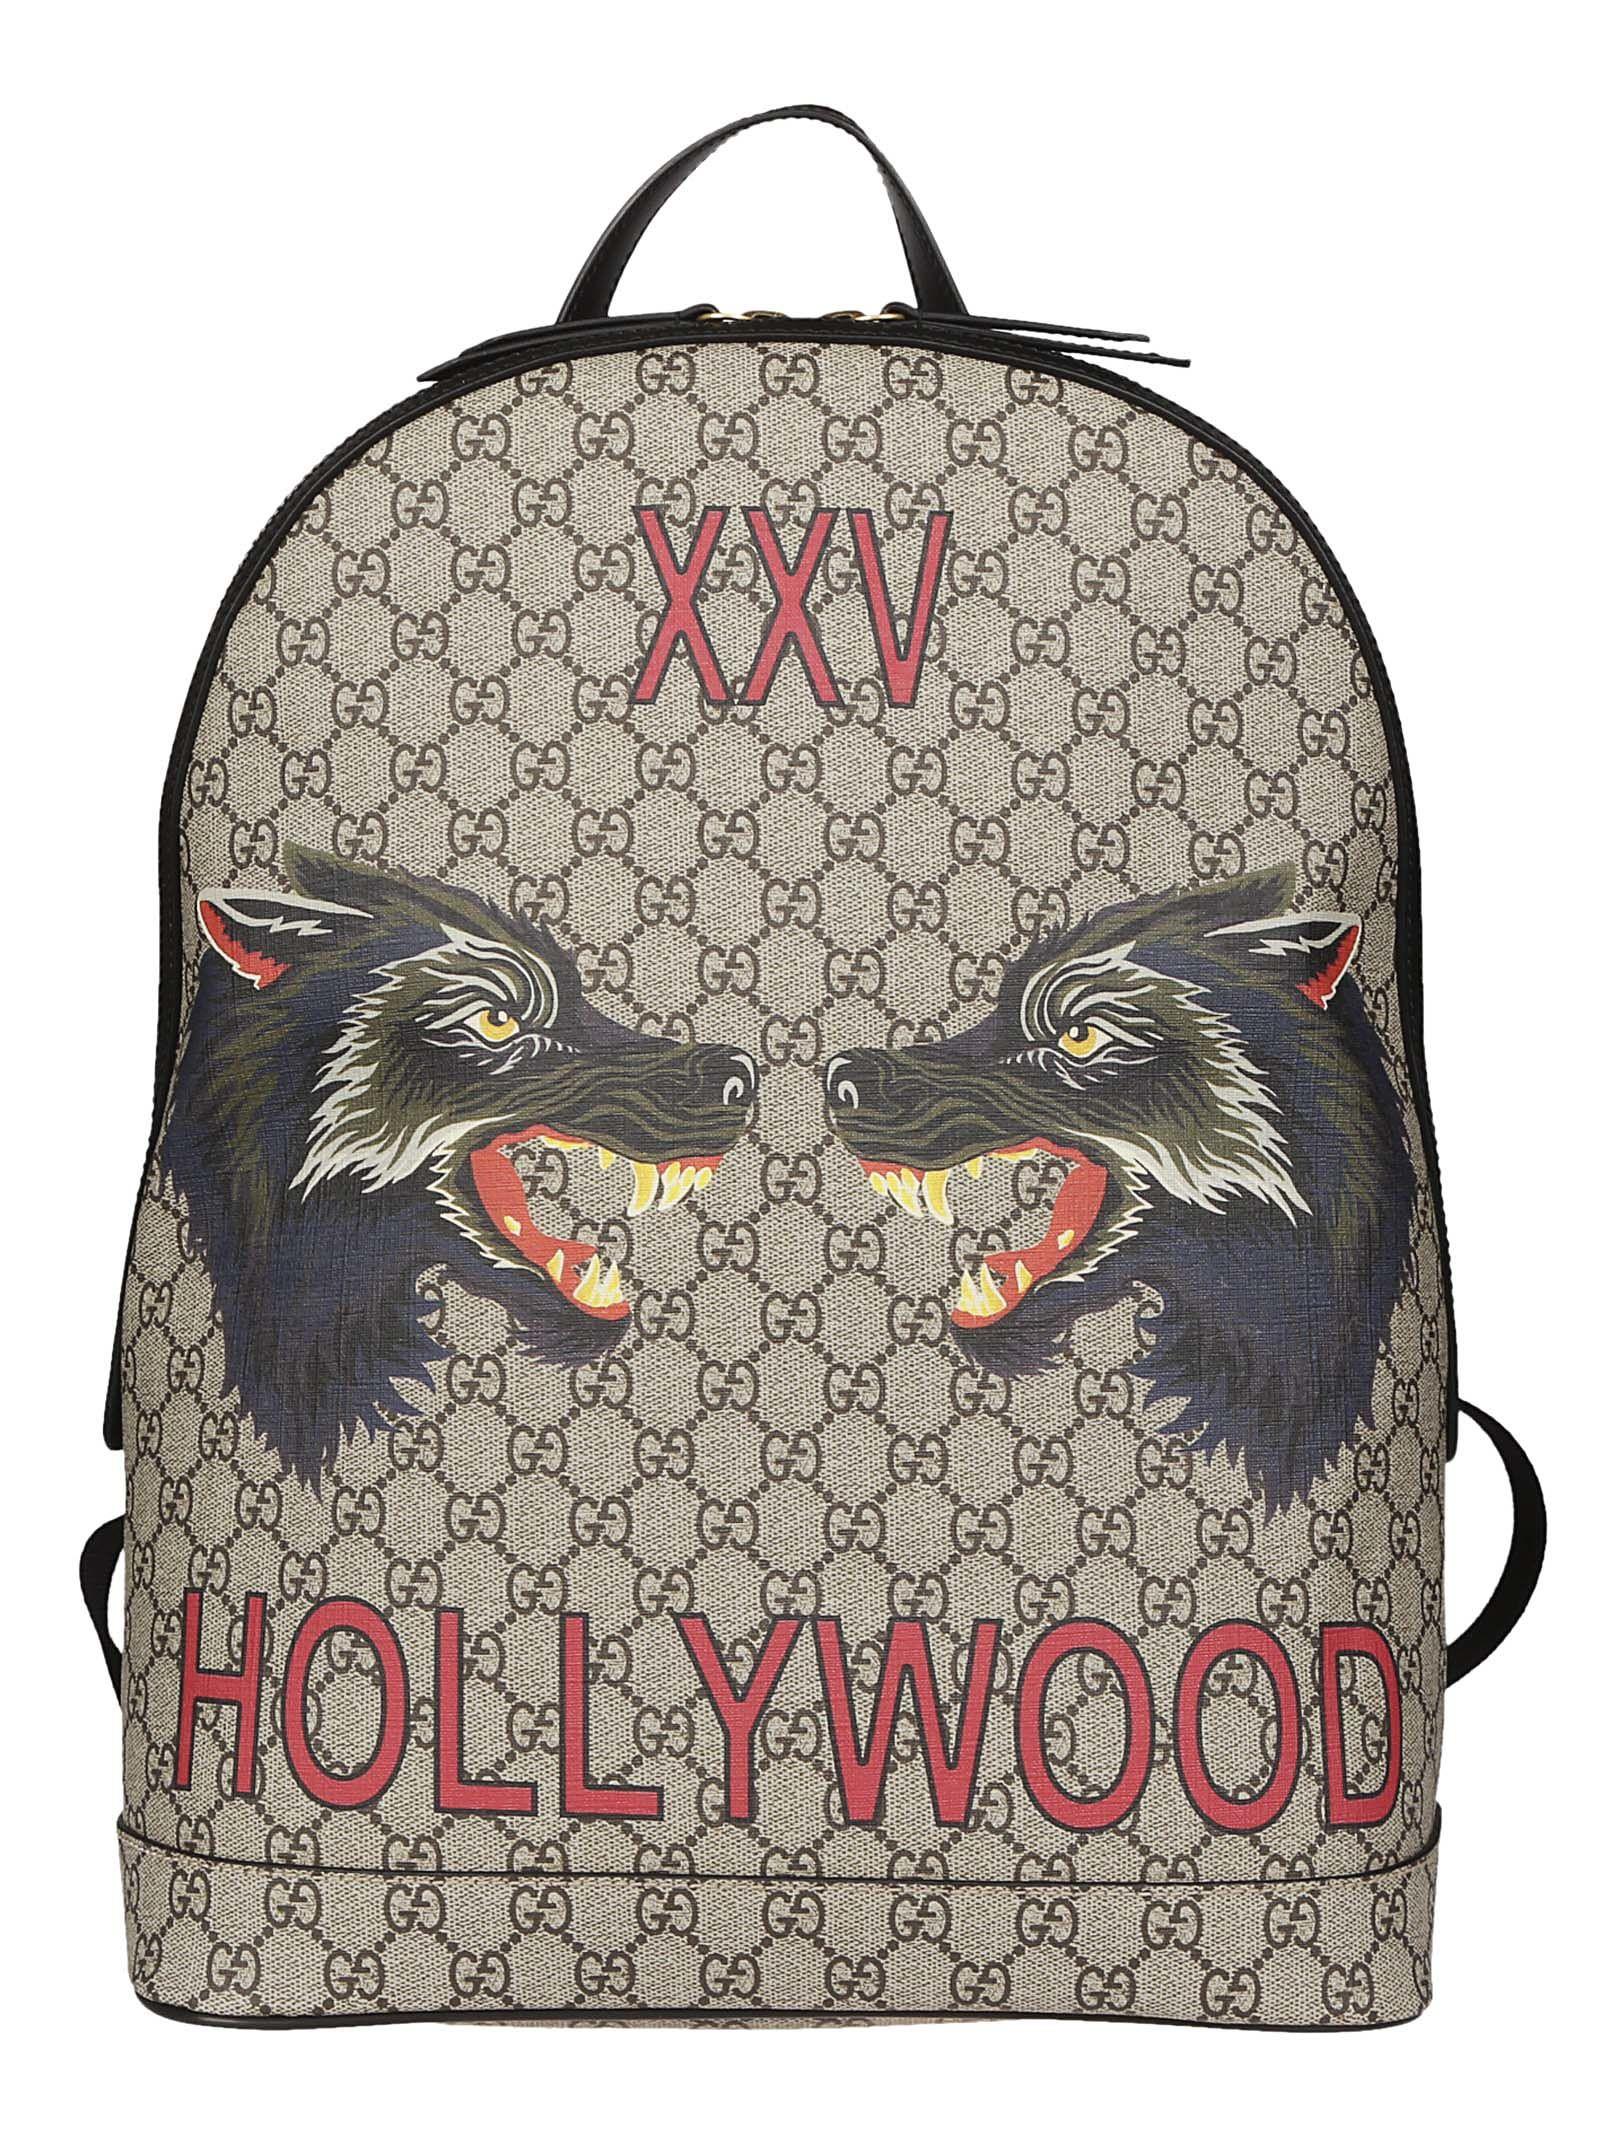 5c91b3e1c46b Gucci Wolf-Print Gg Supreme Backpack - Beige, Tan In Neutrals | ModeSens